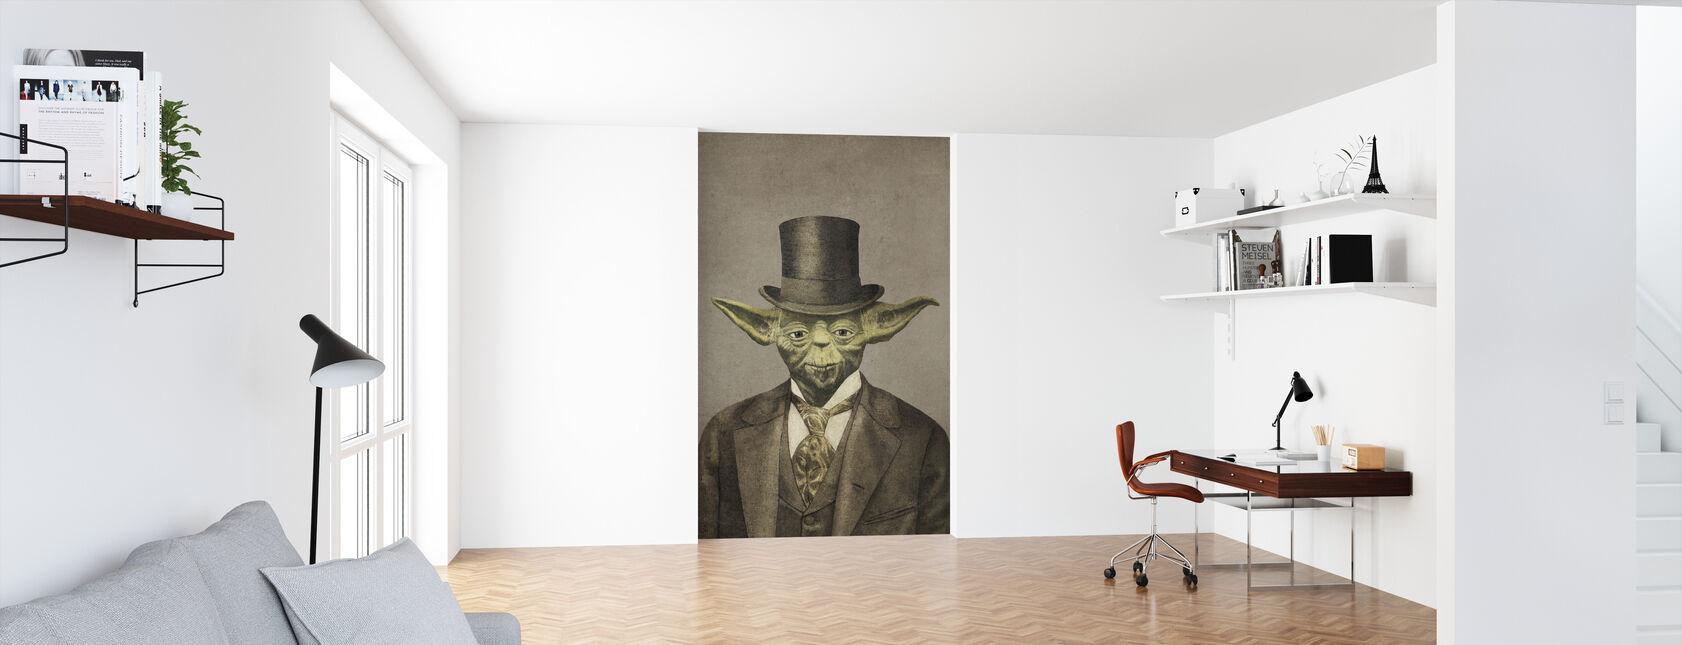 Victorian Wars Sir Yodington - Wallpaper - Office